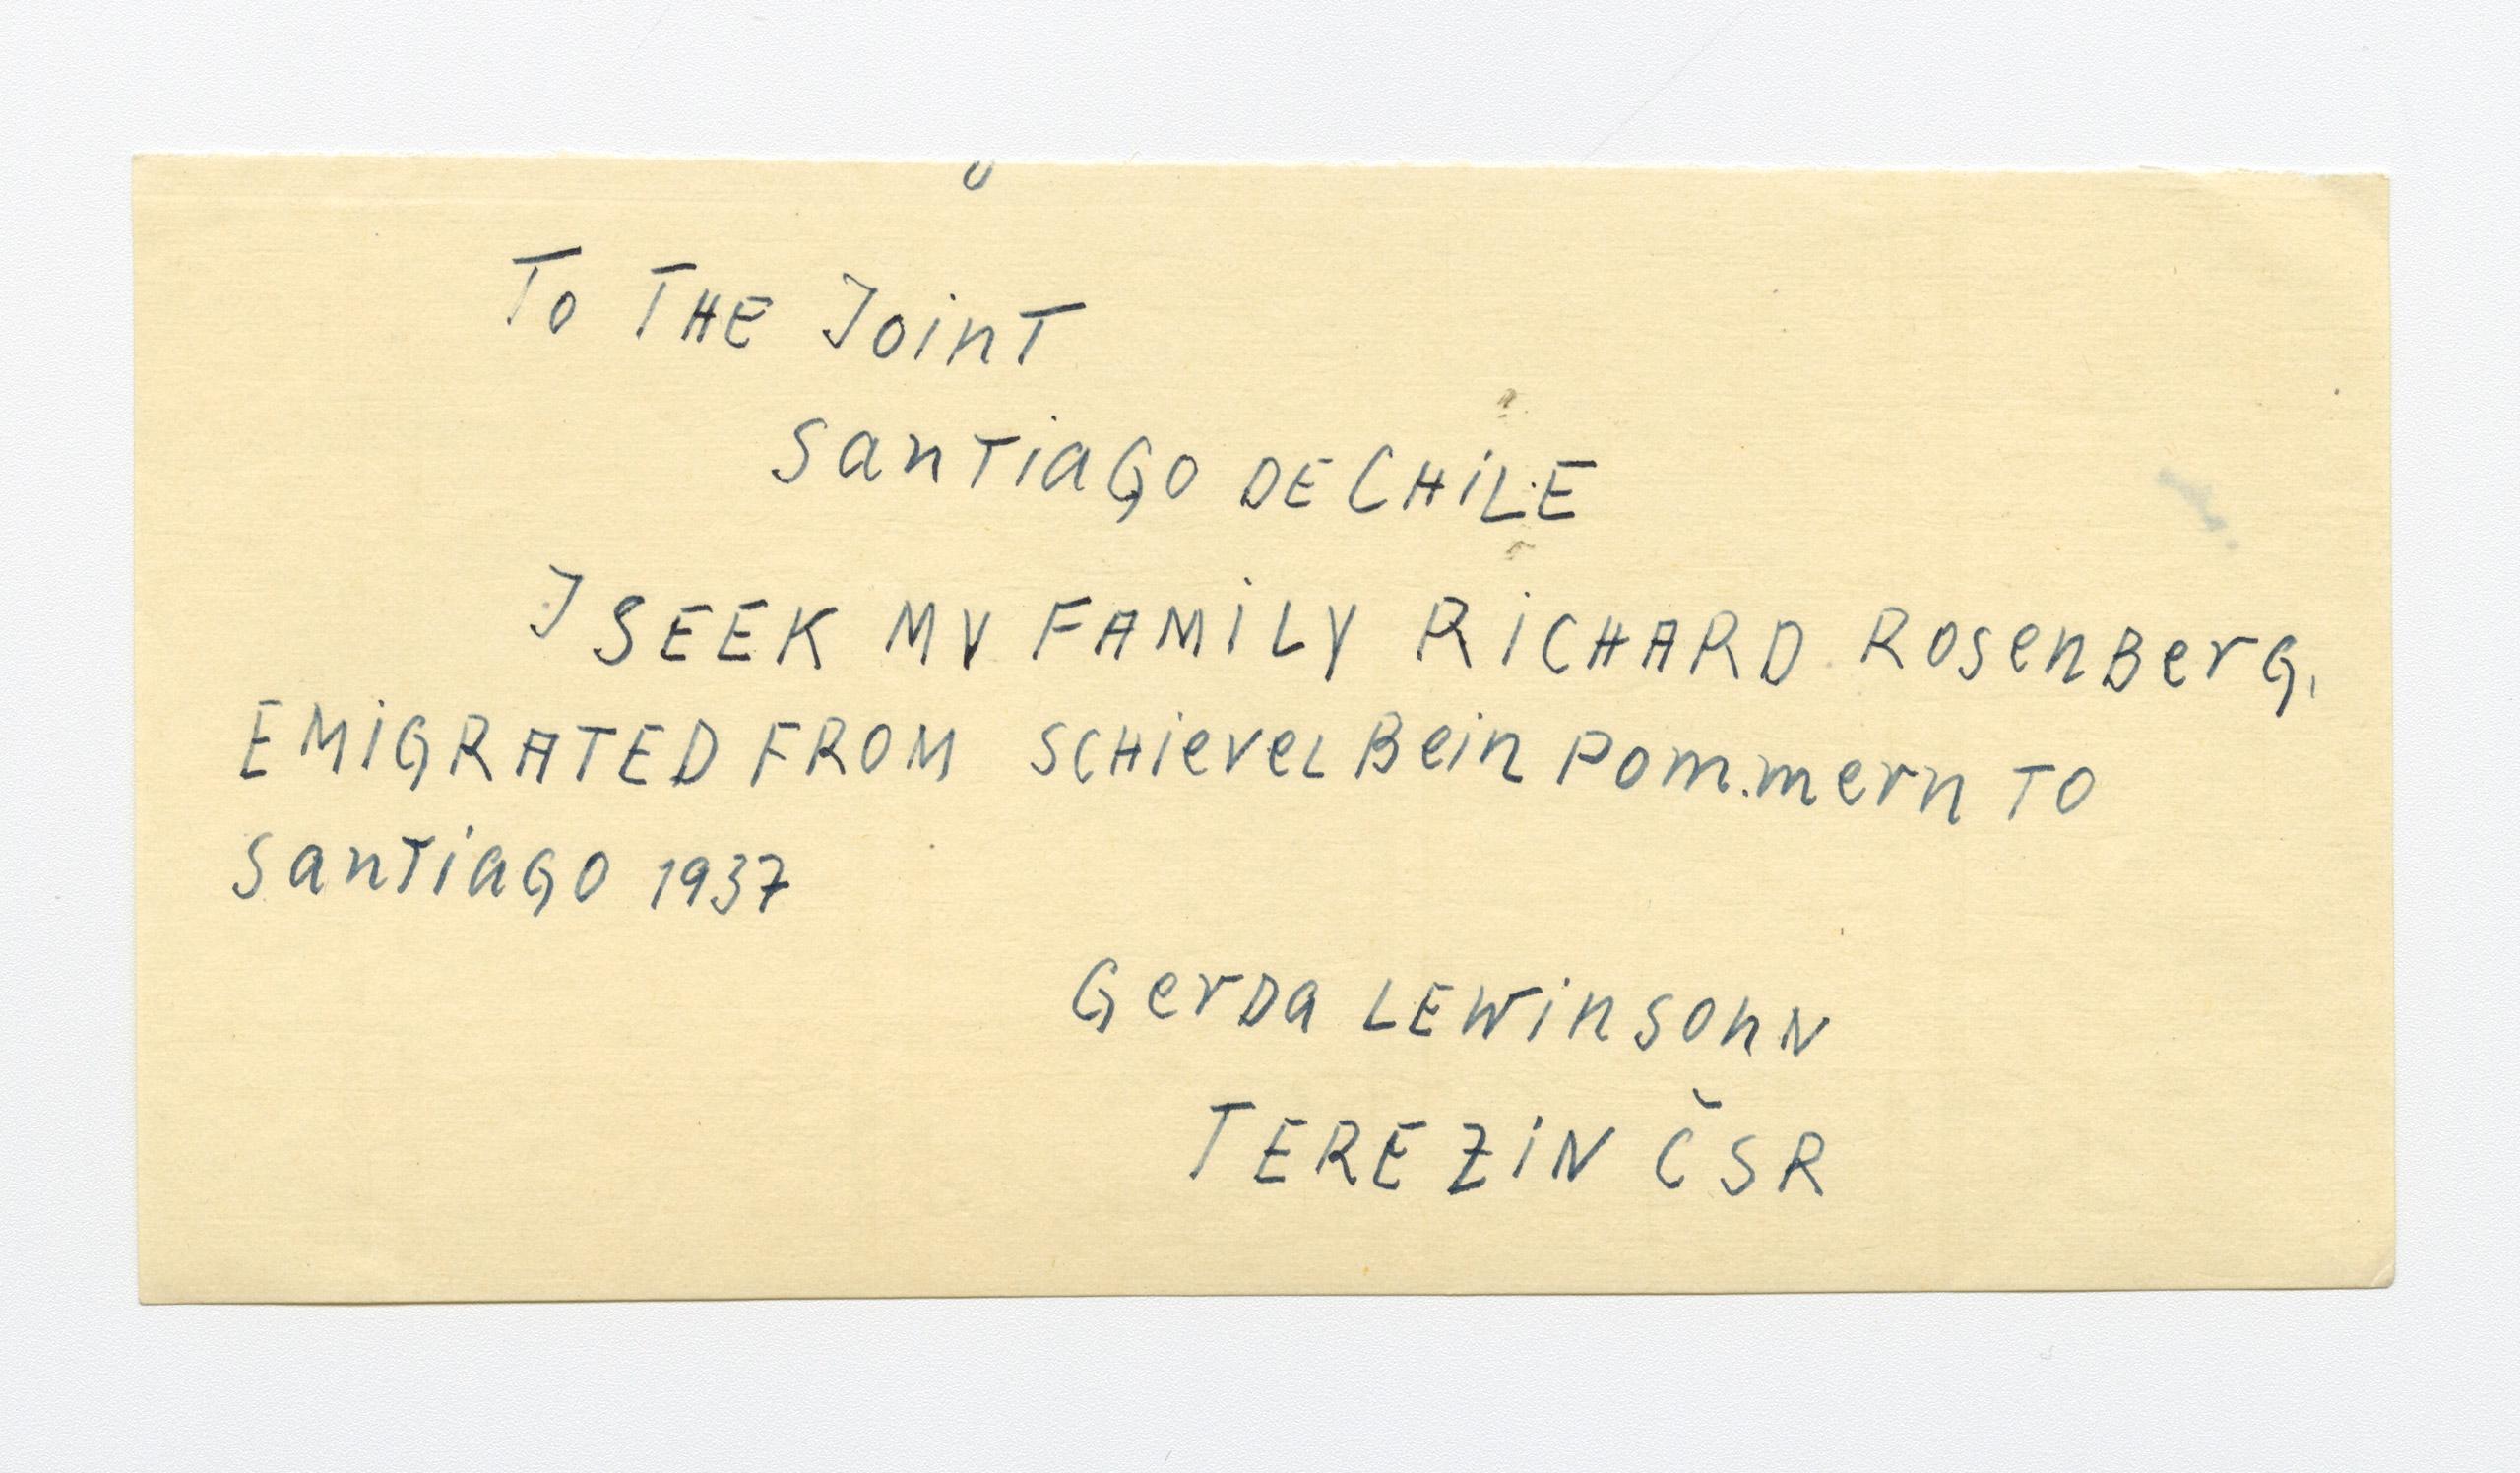 Draft telegram sent by survivors seeking information and assistance.